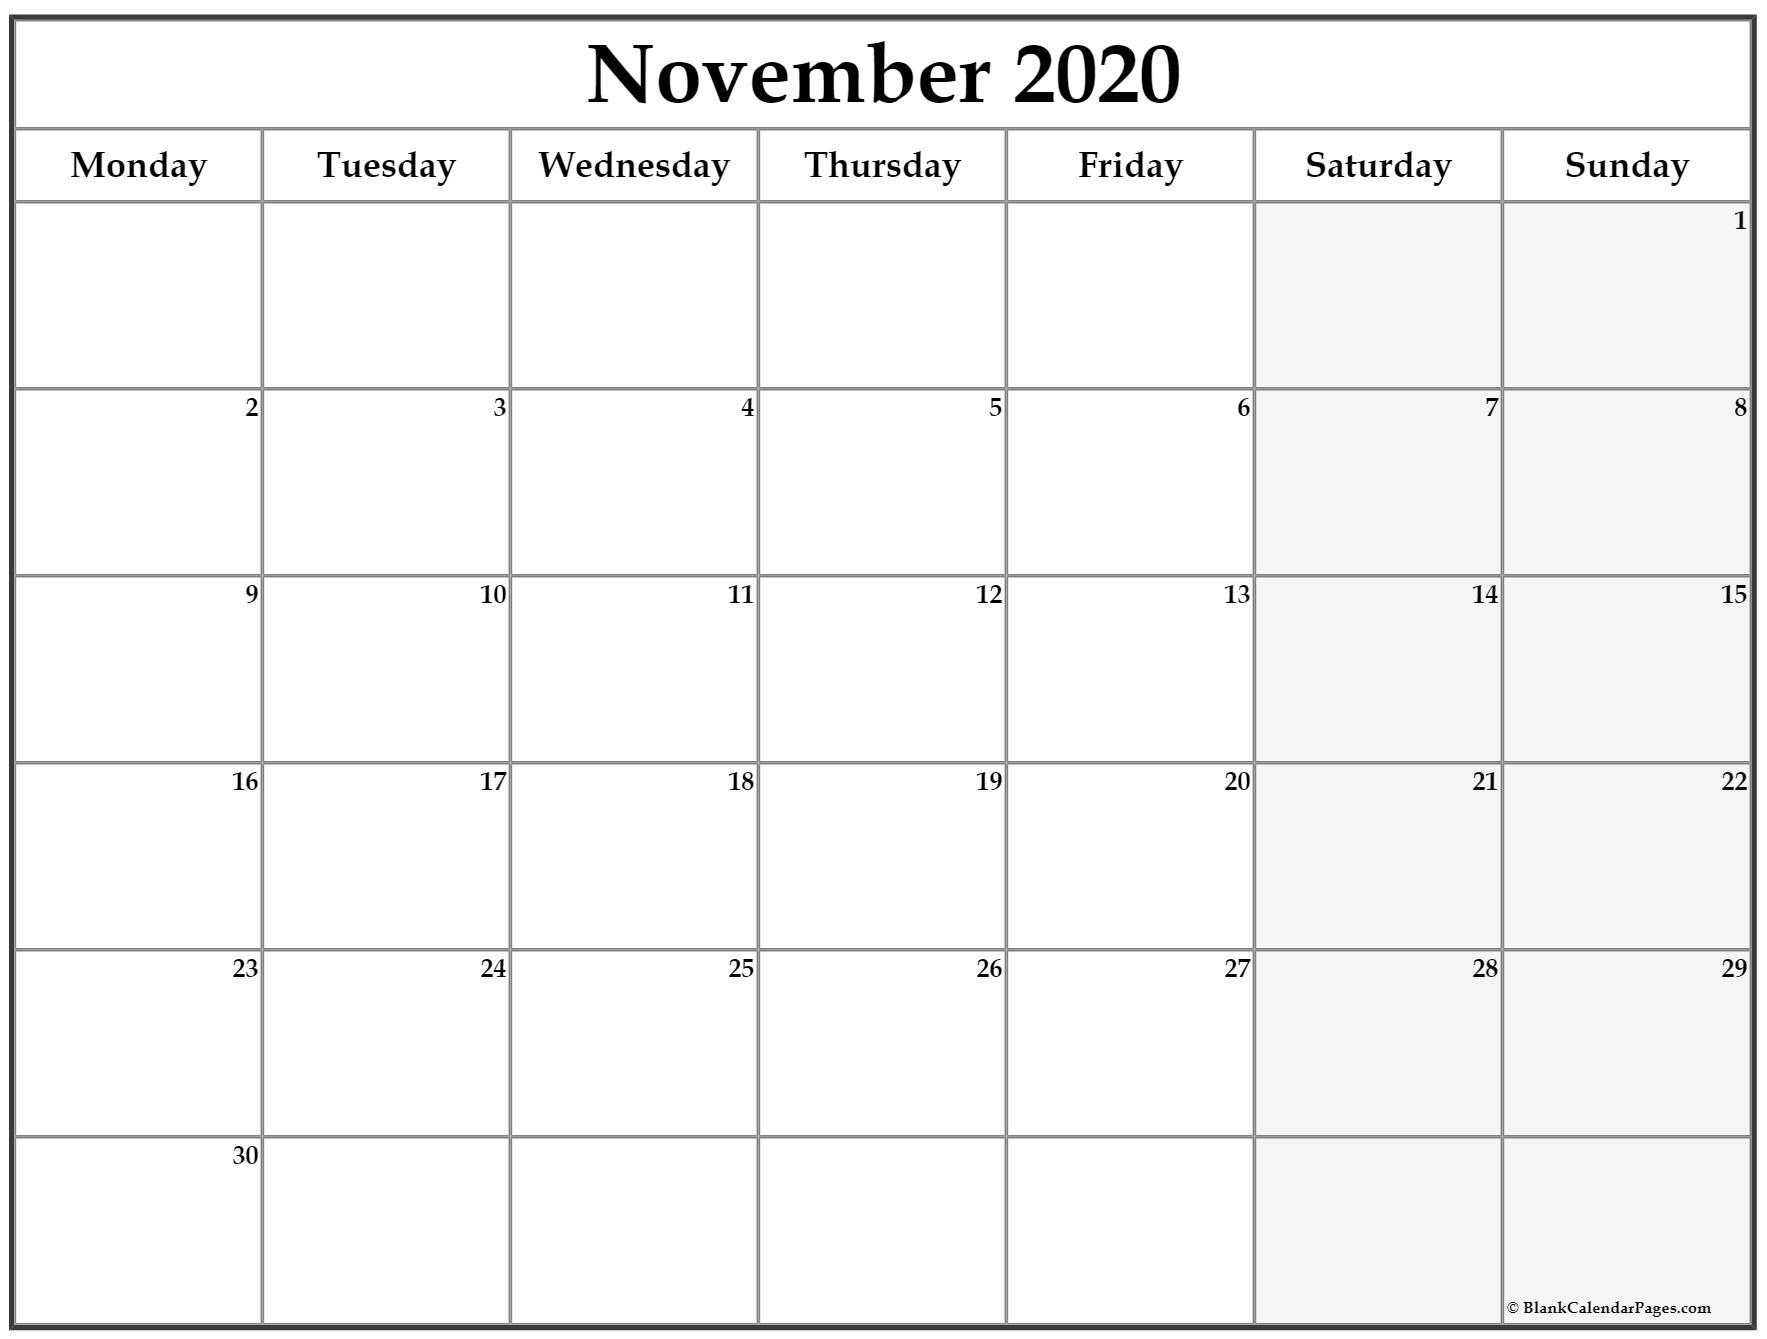 November 2020 Monday Calendar   Monday To Sunday